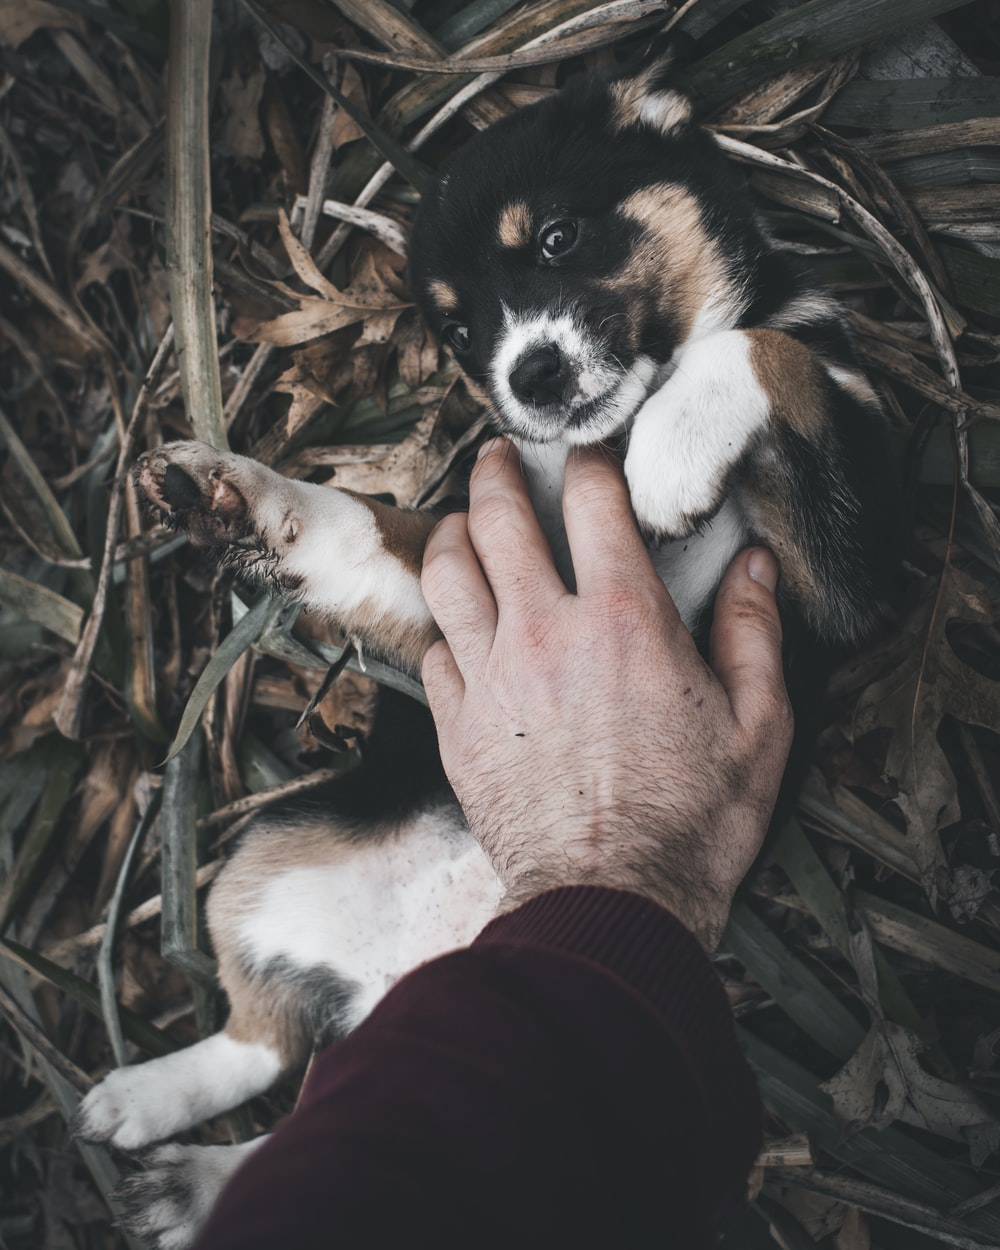 black and white pembroke welsh corgi puppy